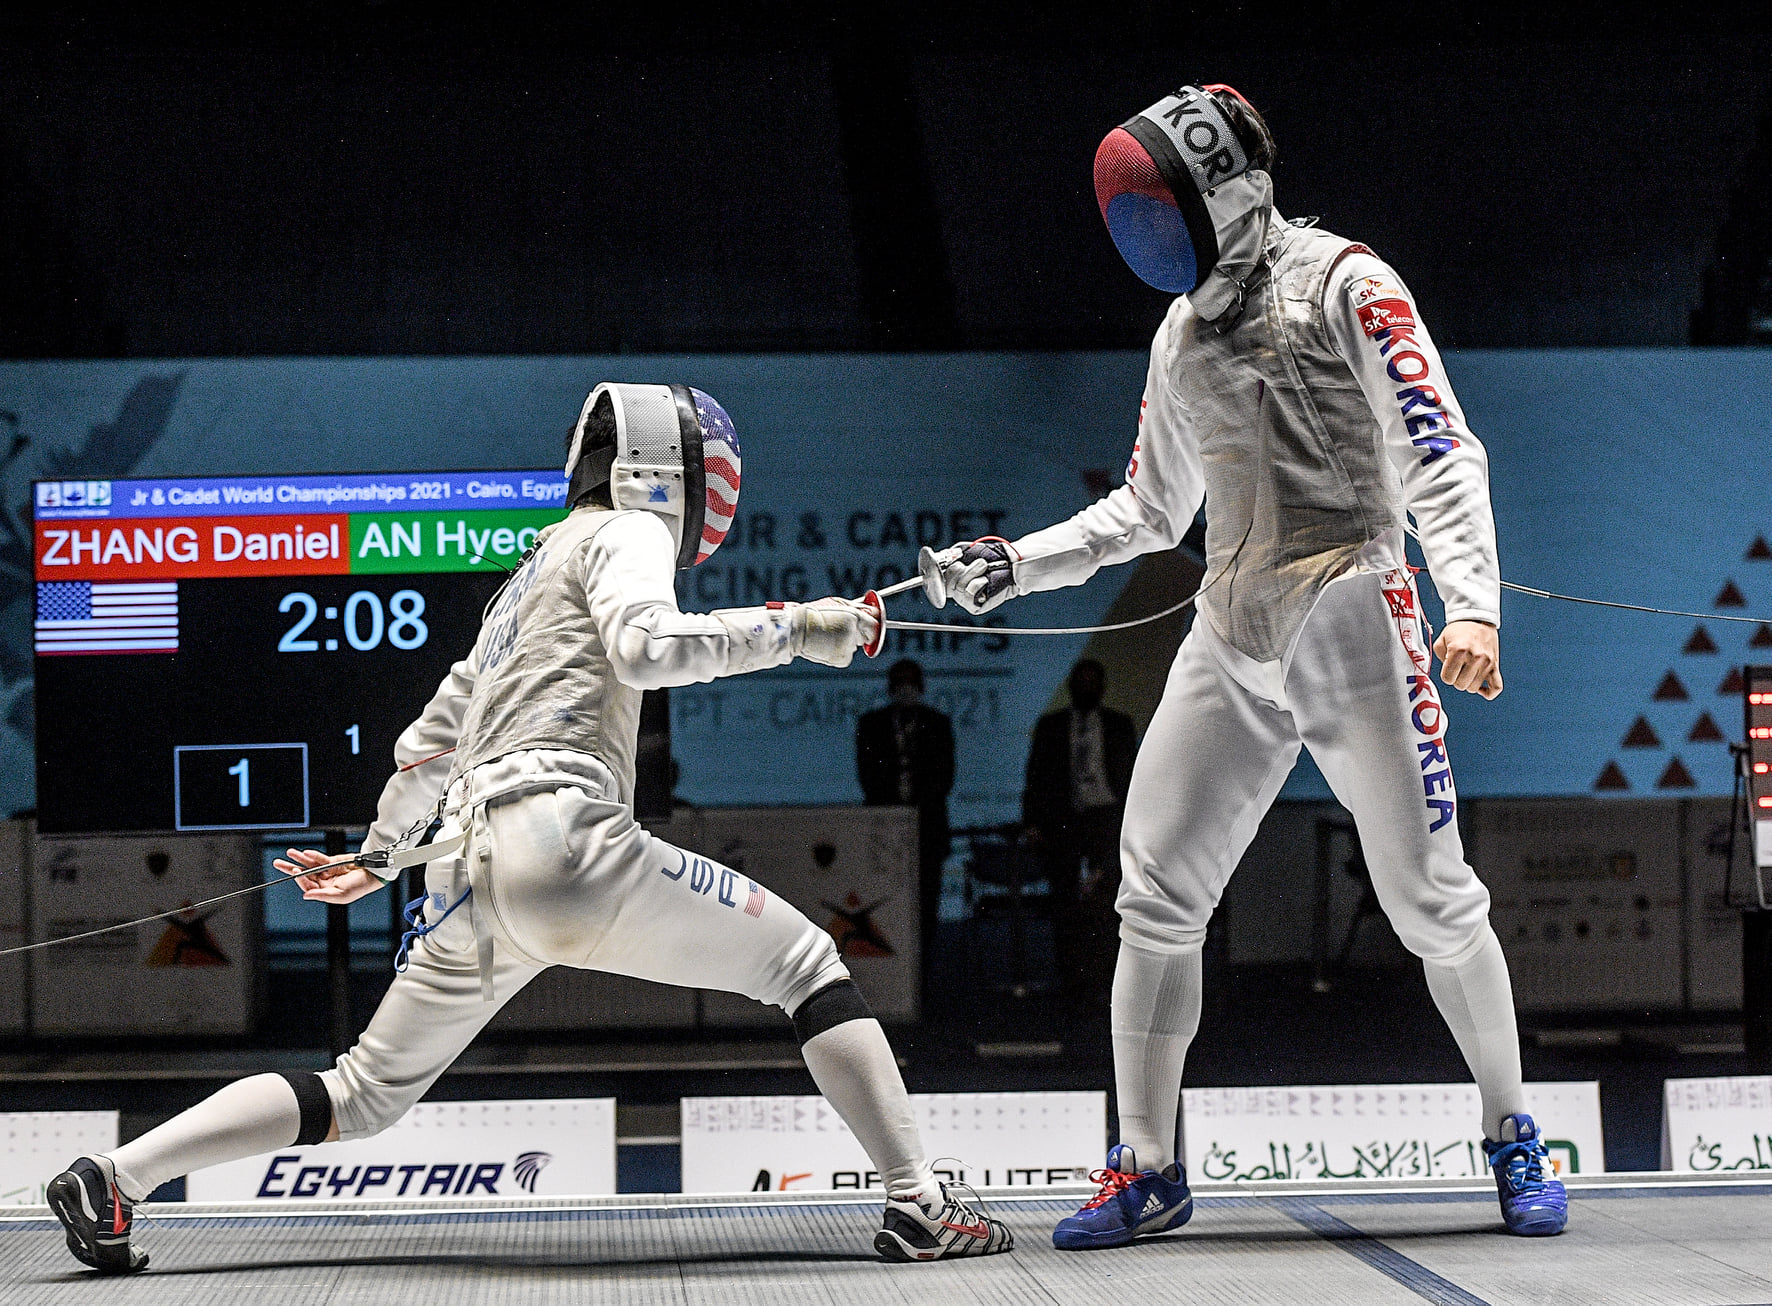 Daniel Zhang USA KOR vence mundial cadete